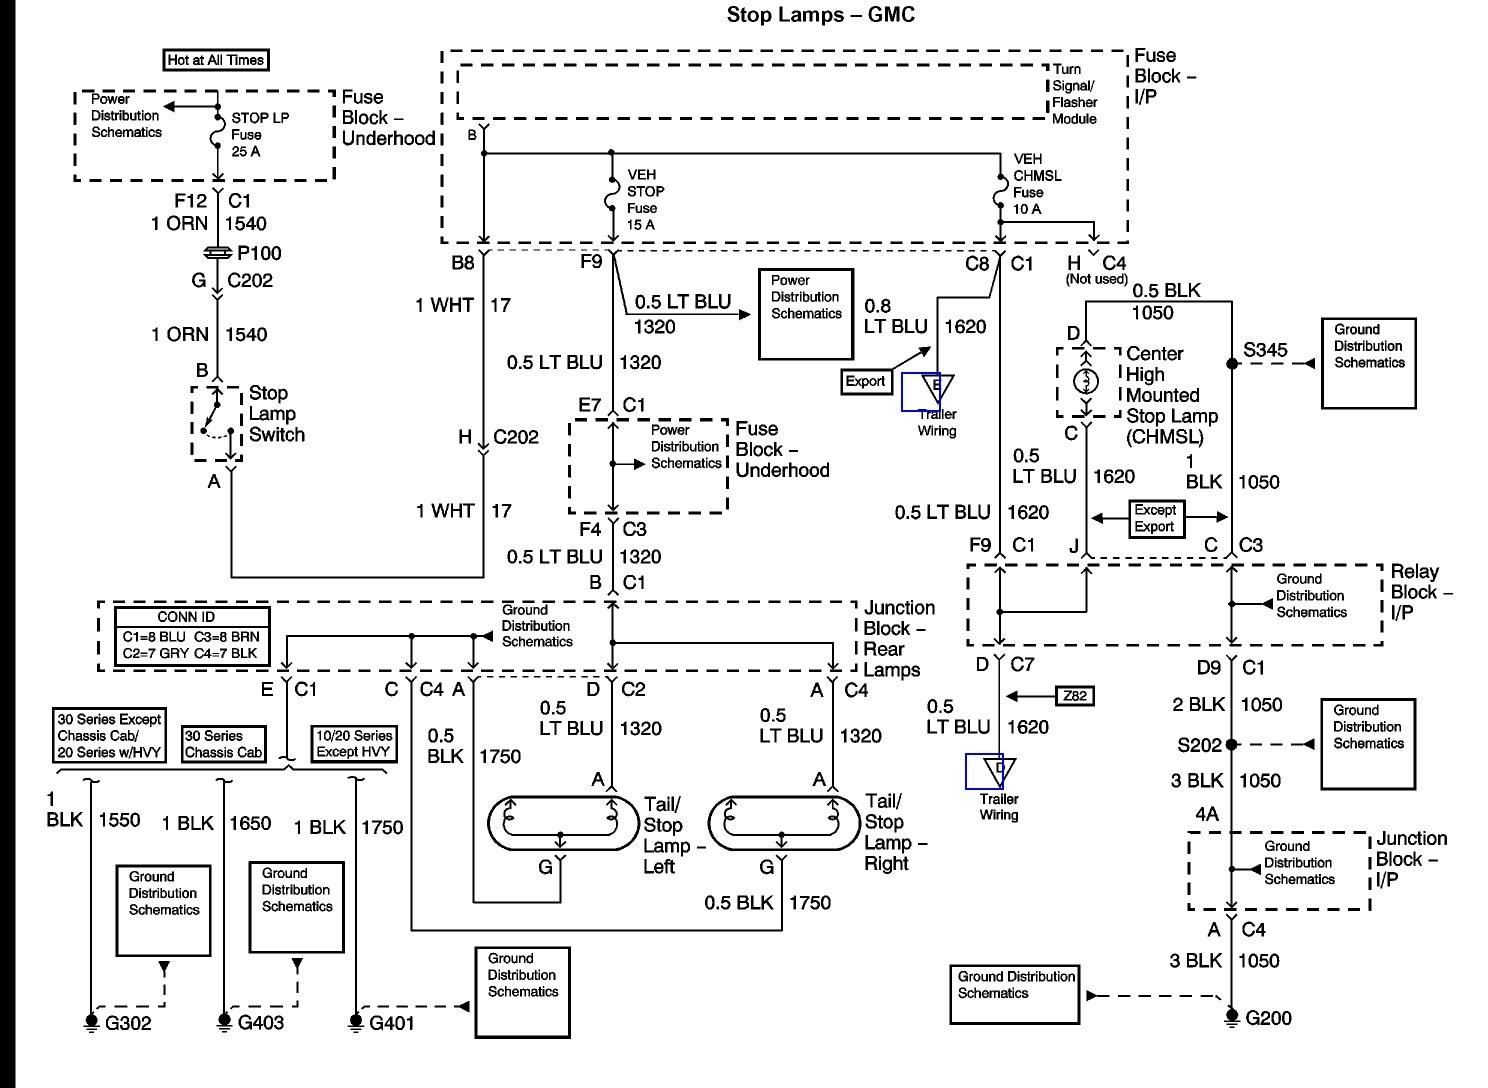 1994 Chevy Truck Brake Light Wiring Diagram | Schematic Diagram - Chevy Silverado Wiring Diagram